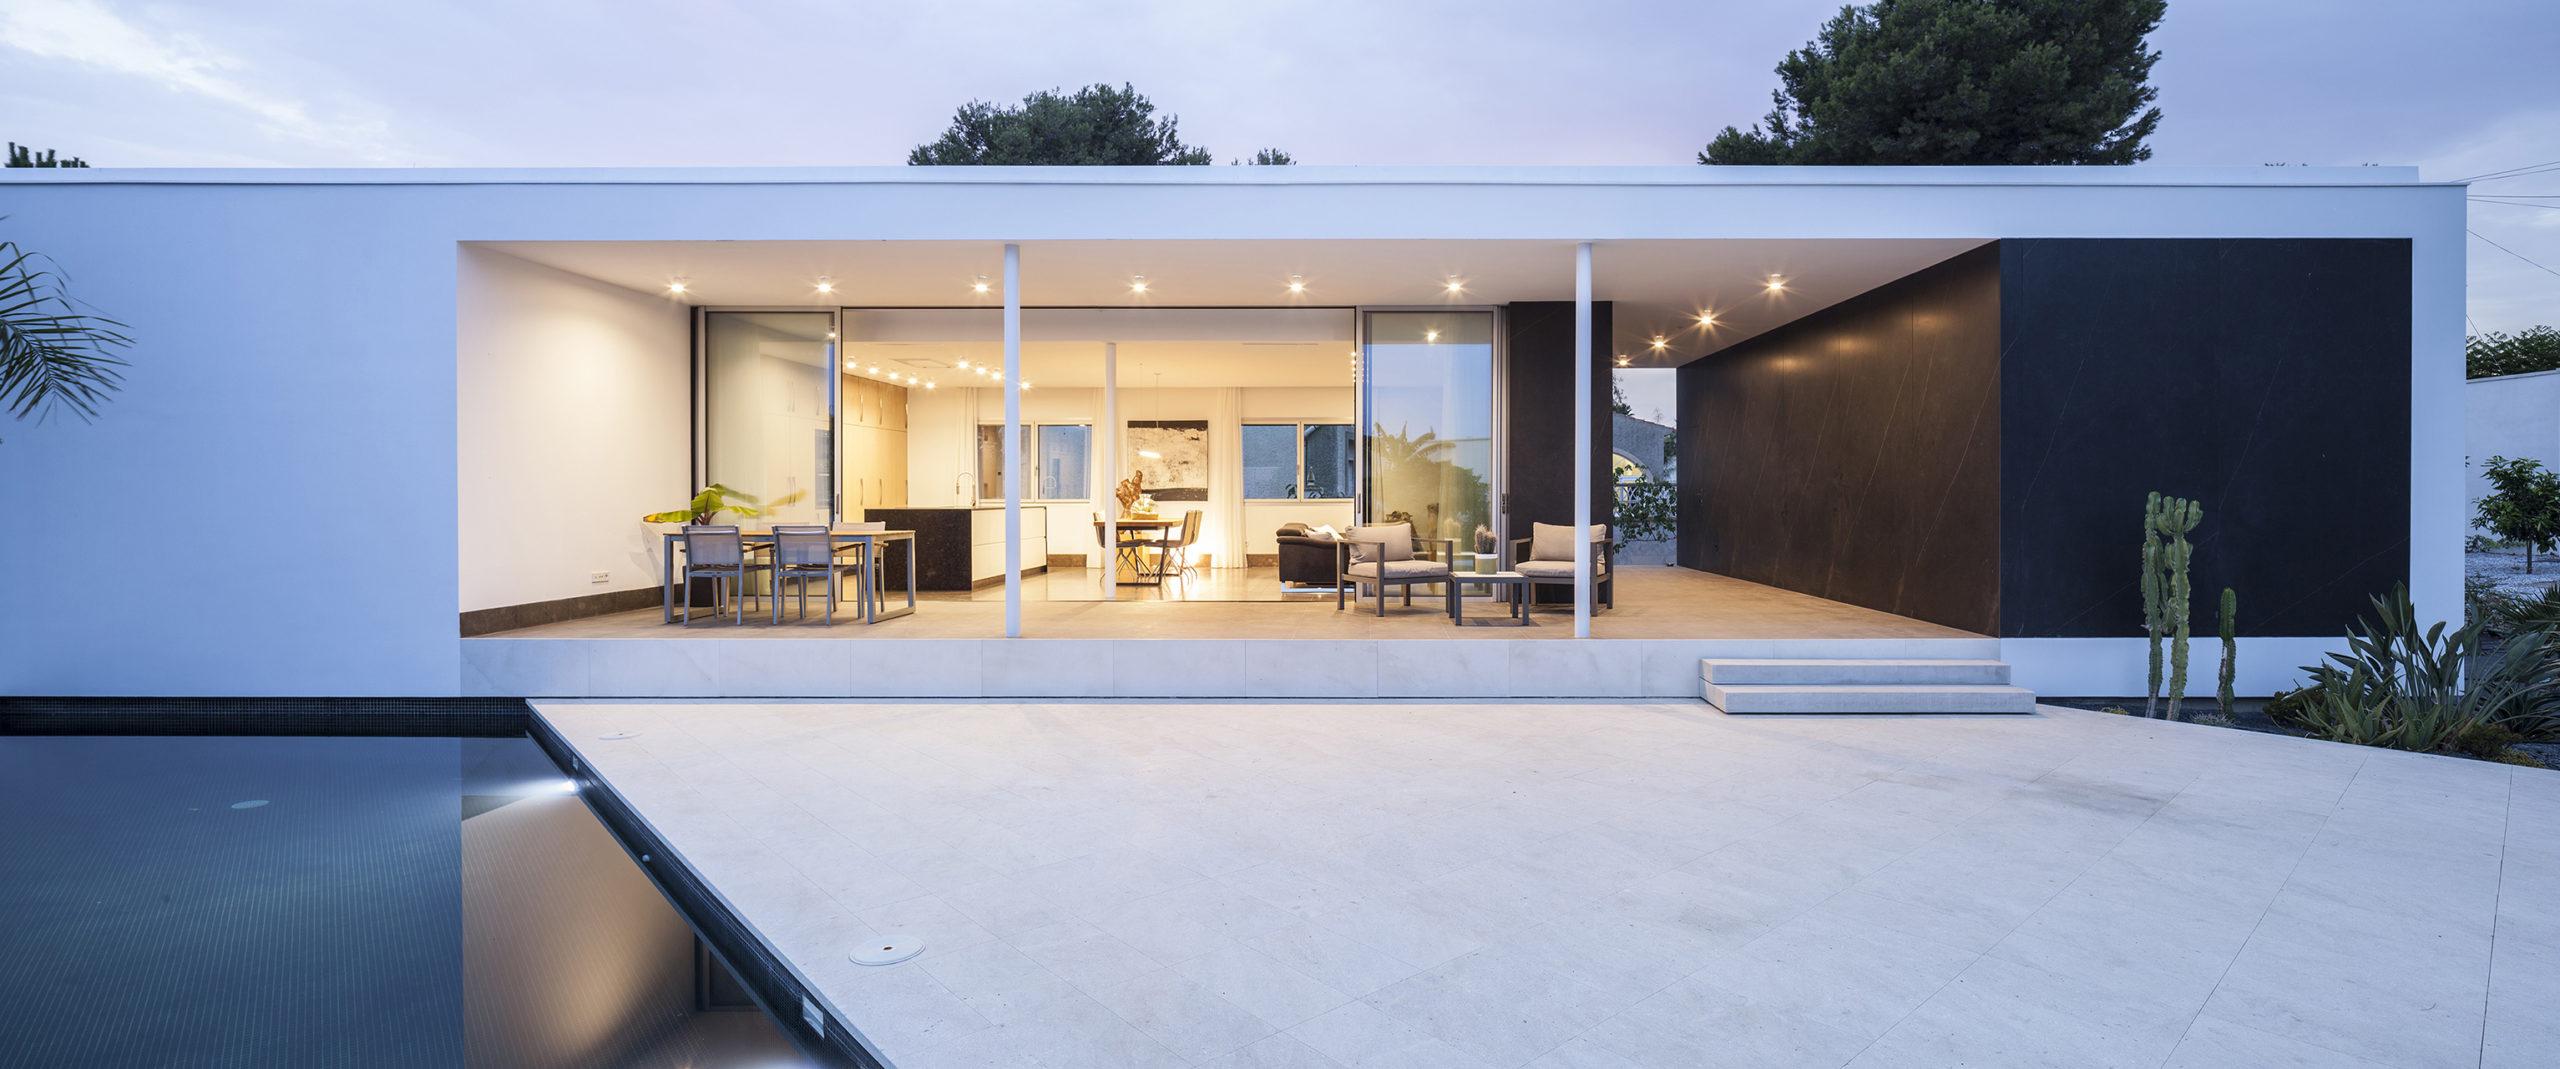 Estudio de arquitectura e interiorismo en Alicante.